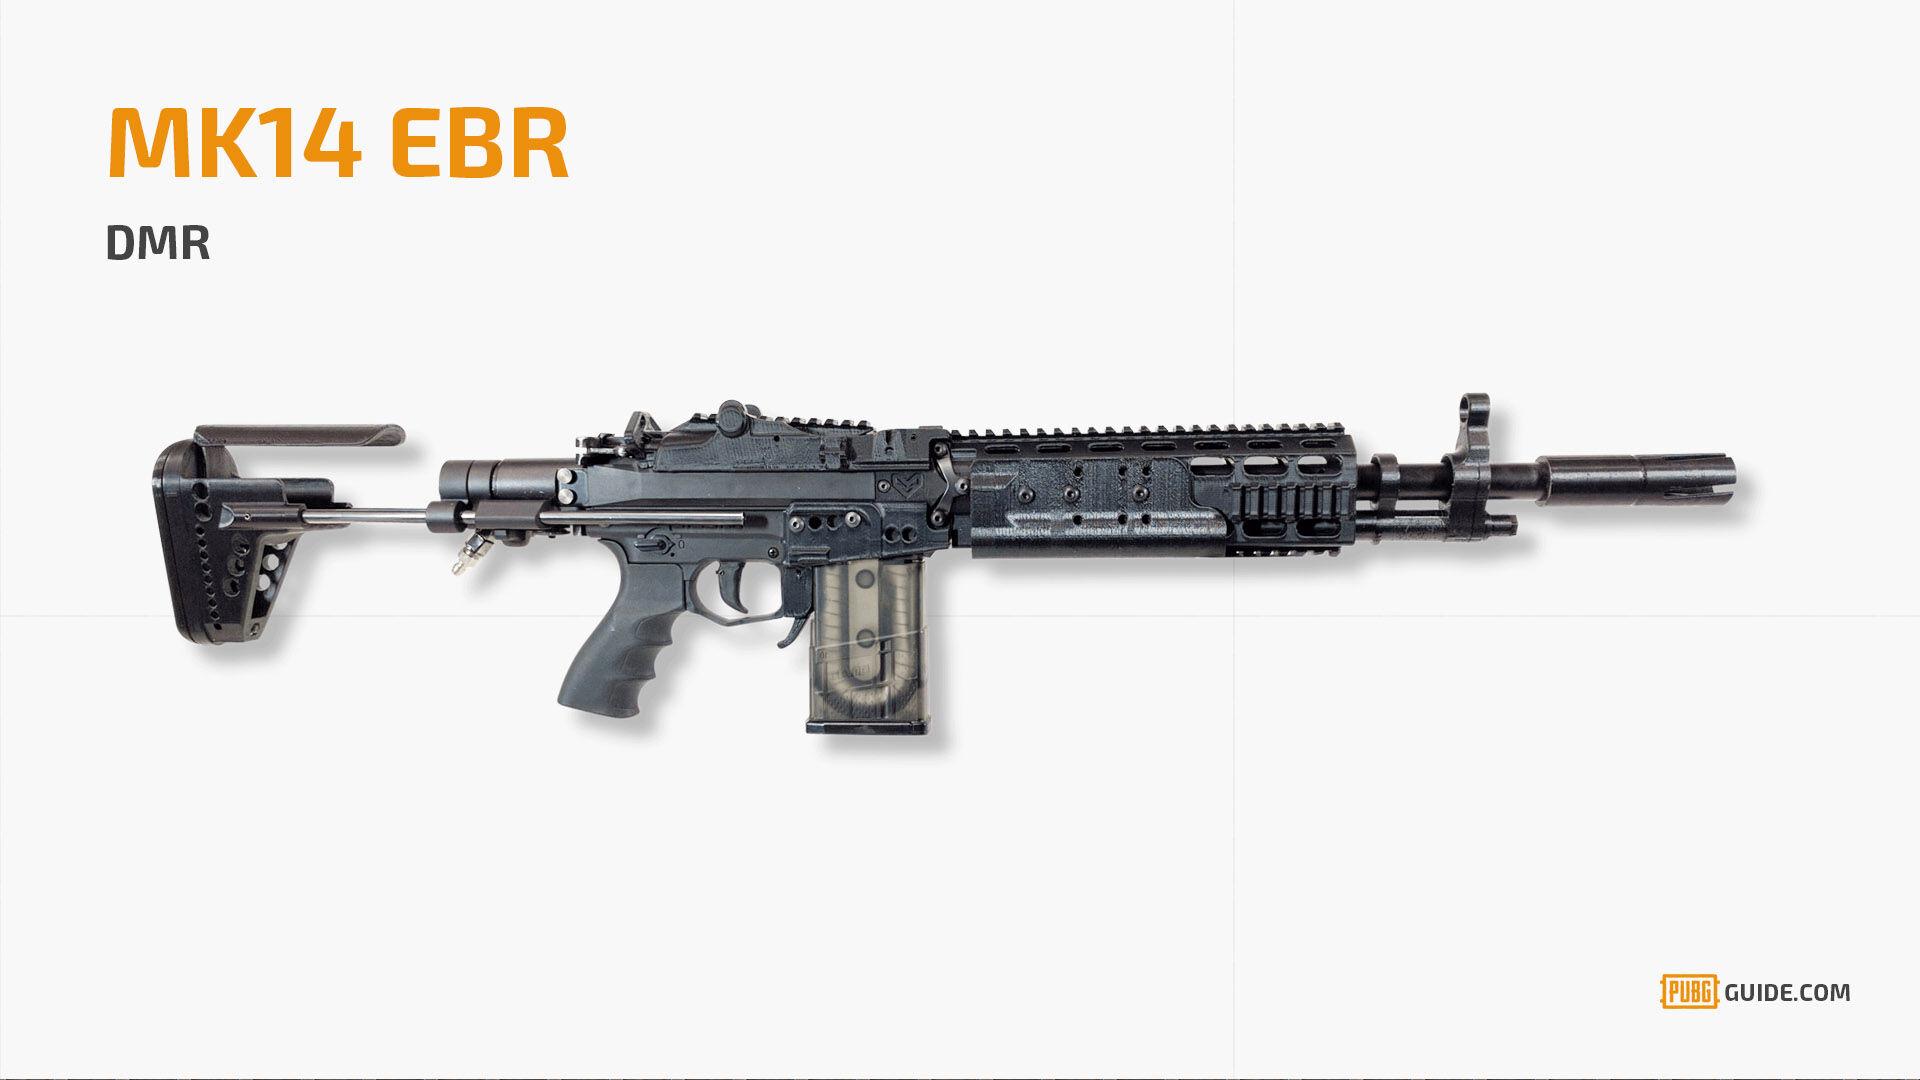 Pubg Weapon Mk14 EBR 1 6a651